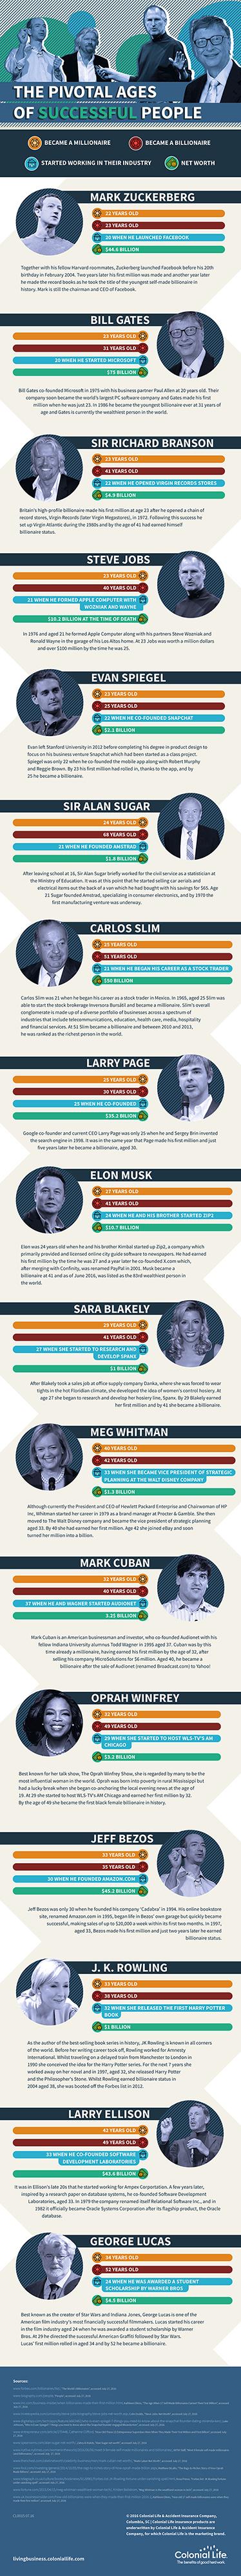 age-infographic-entrepreneurs-une